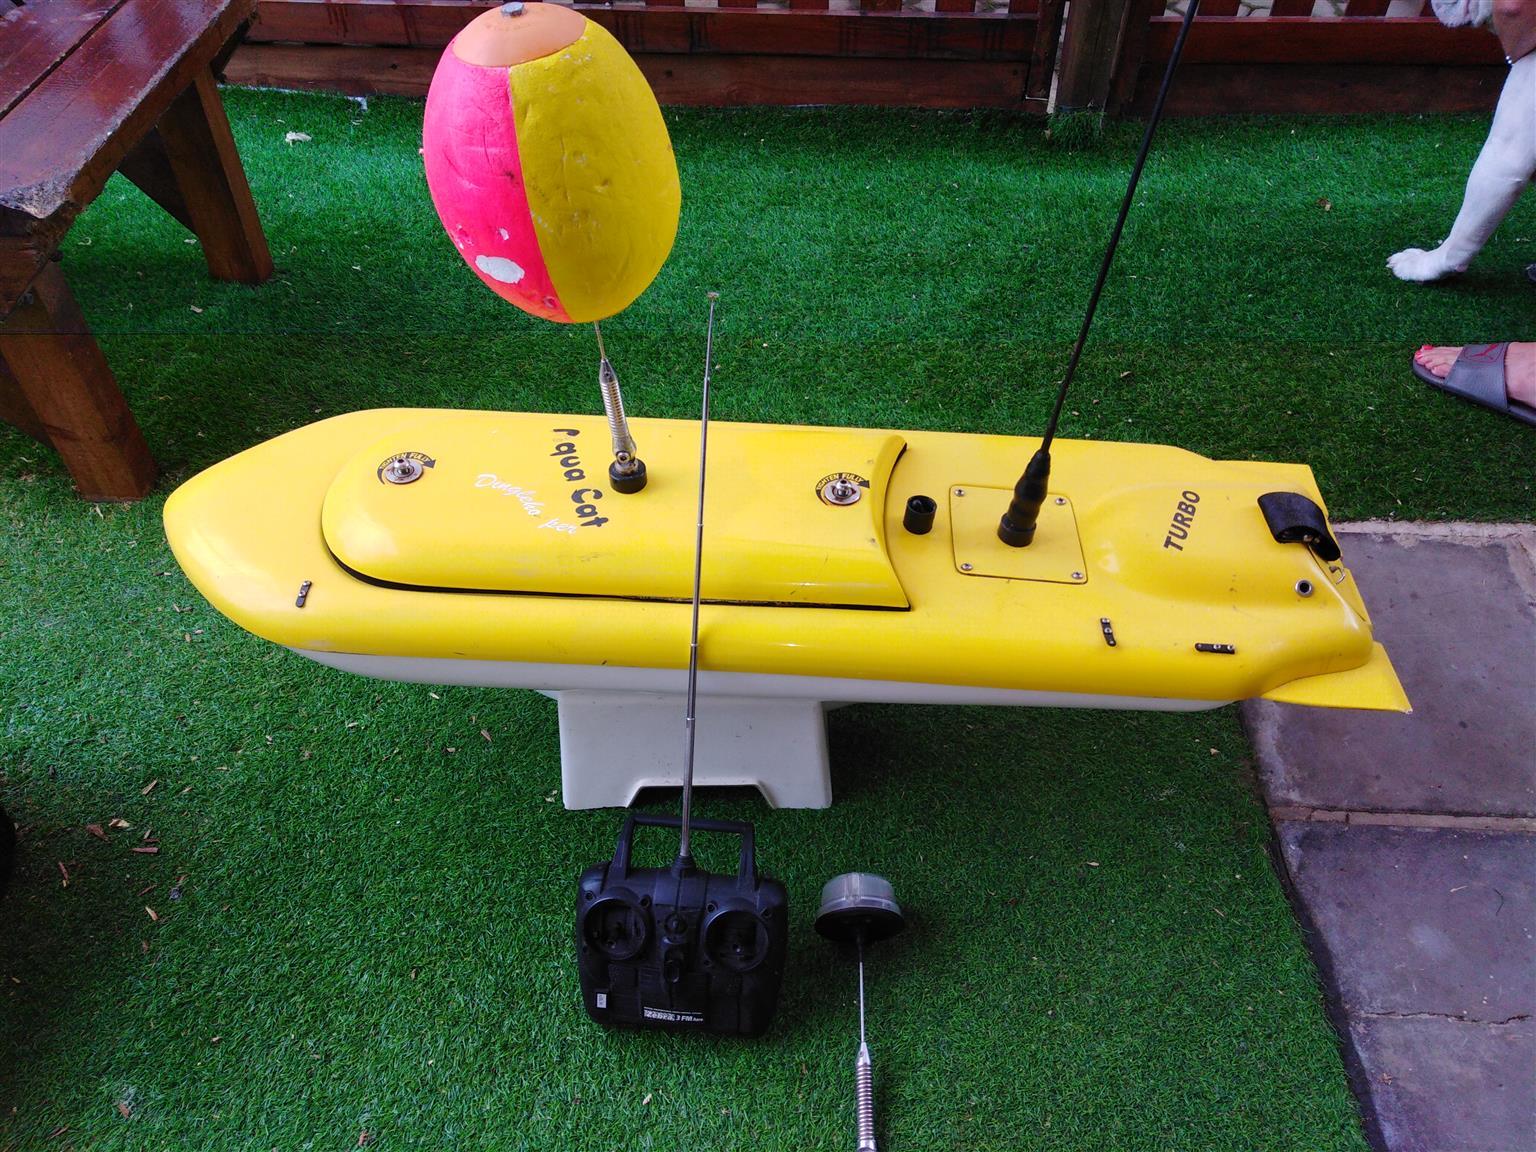 Aqua cat dingle hopper turbo for sale. Good for fishing in the ocean or dams.